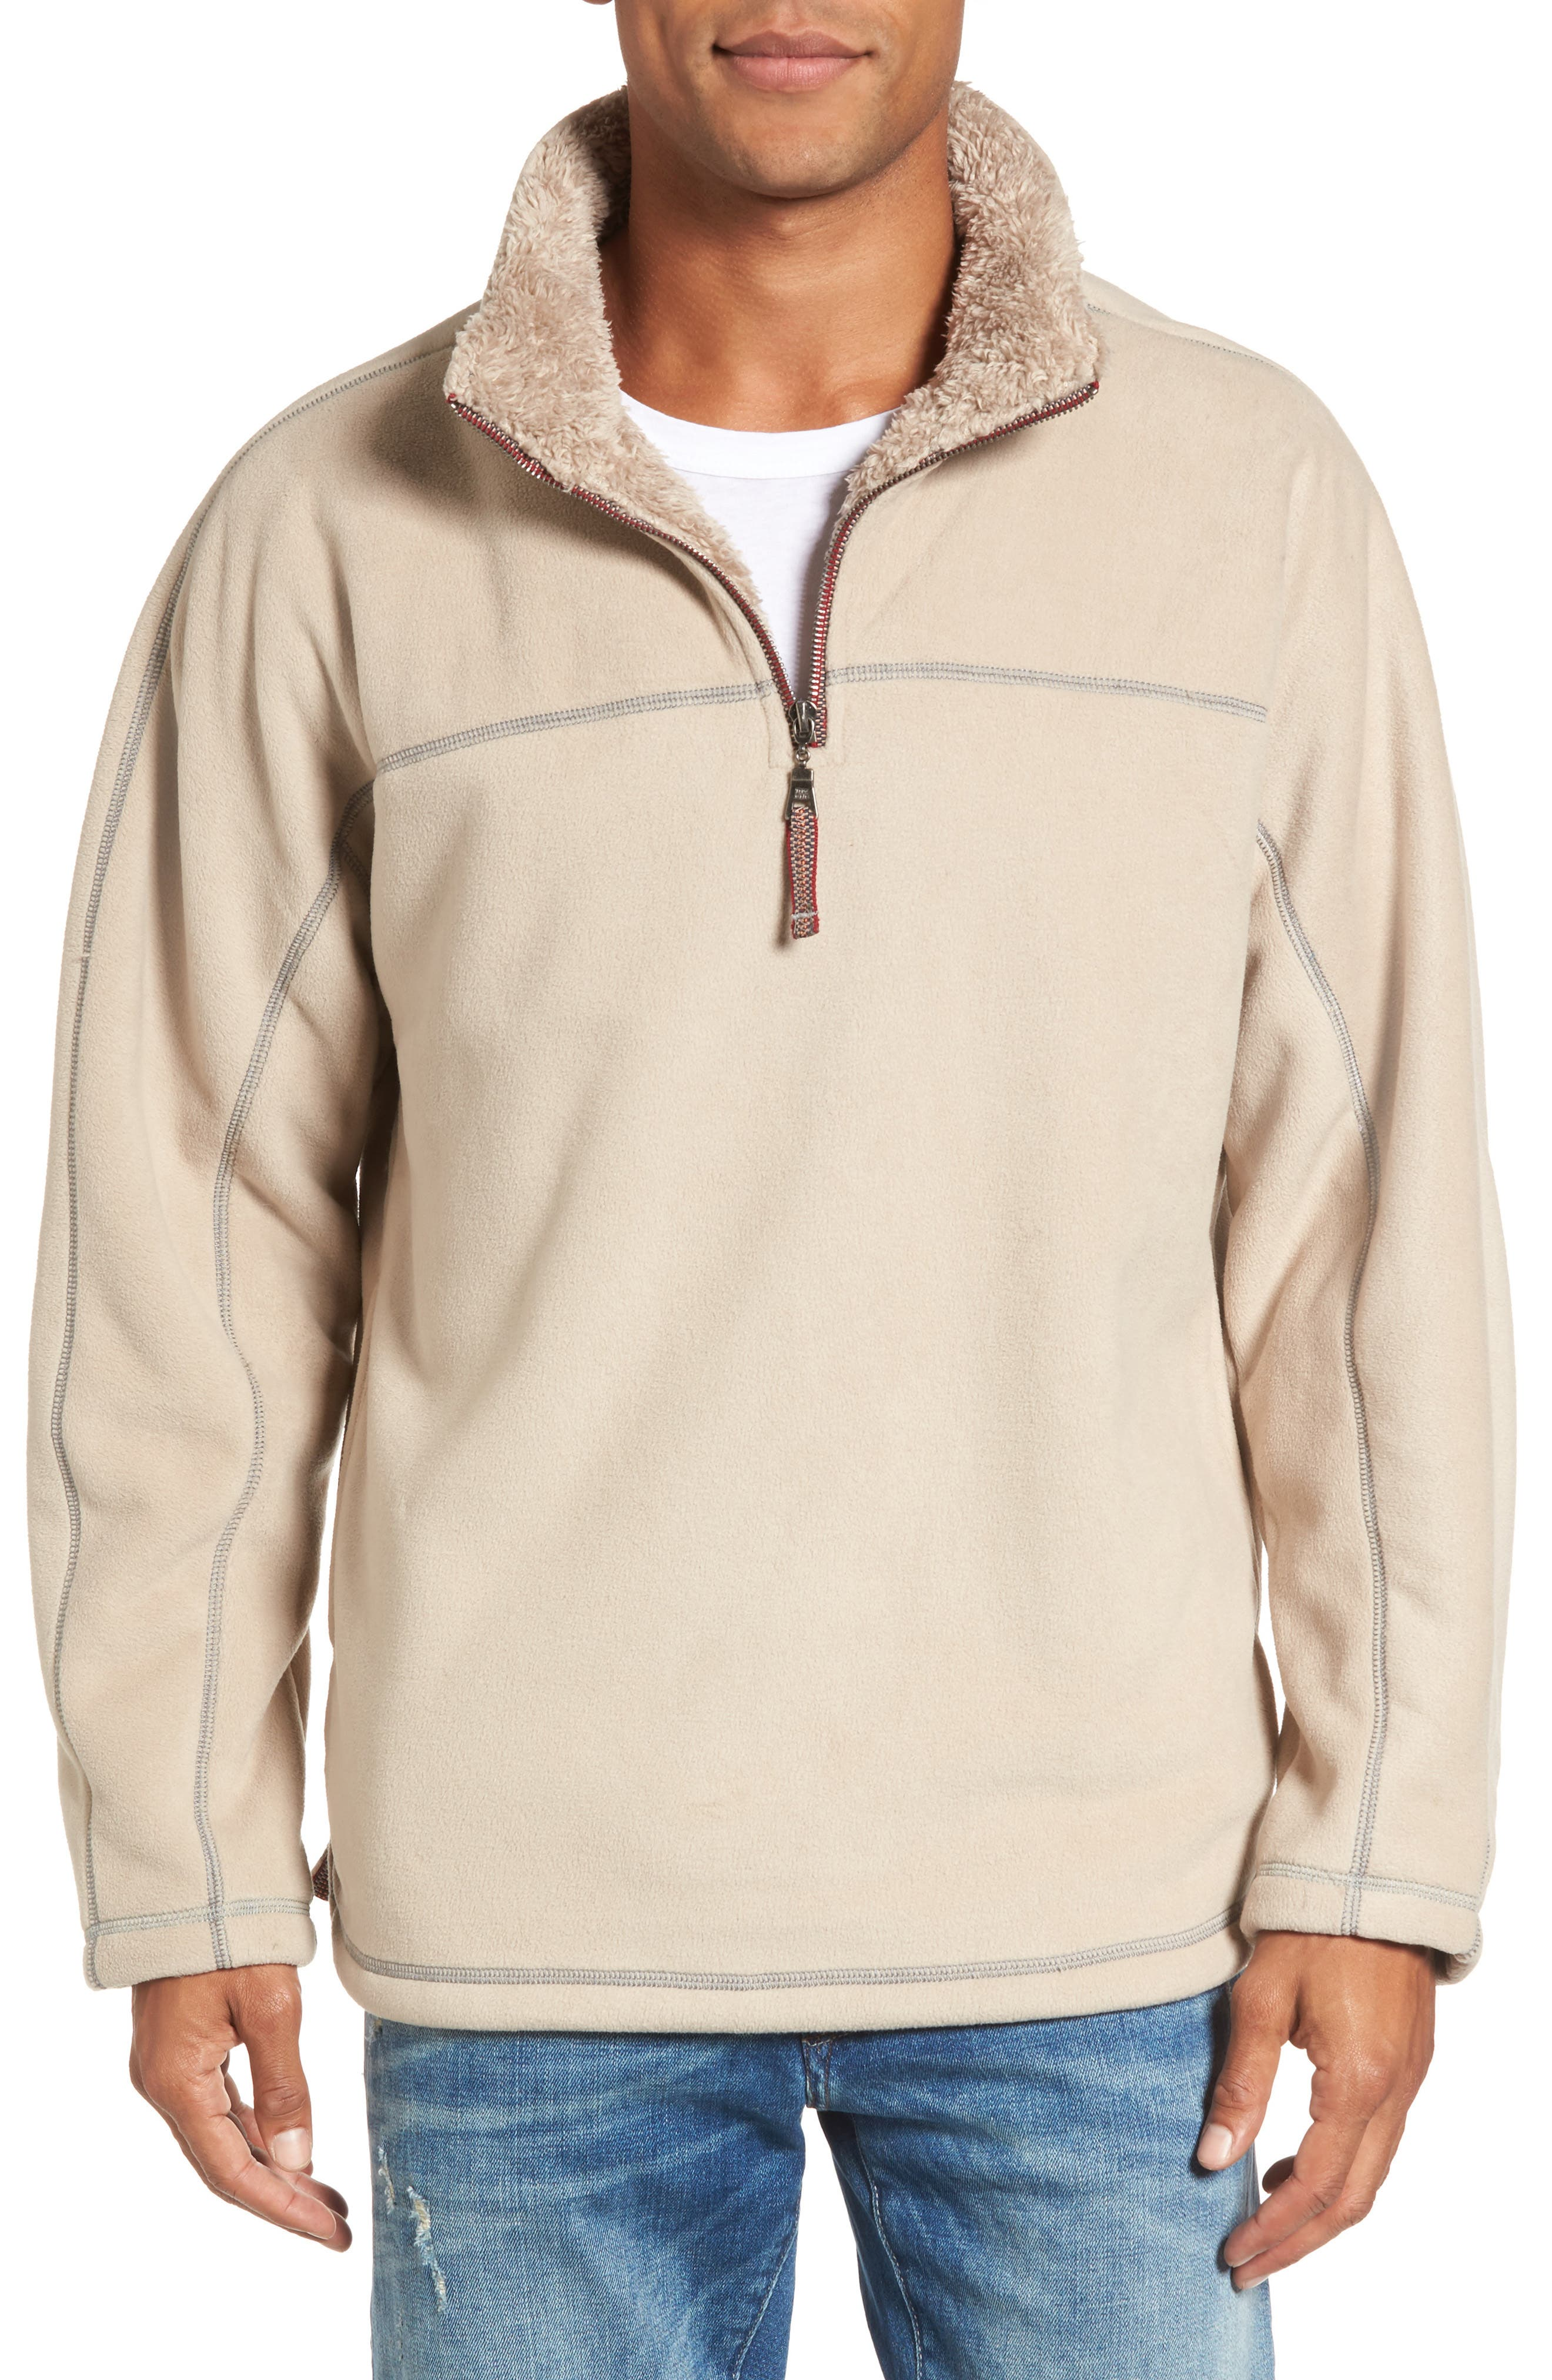 Bonded Polar Fleece Lined Pullover,                         Main,                         color, Sand